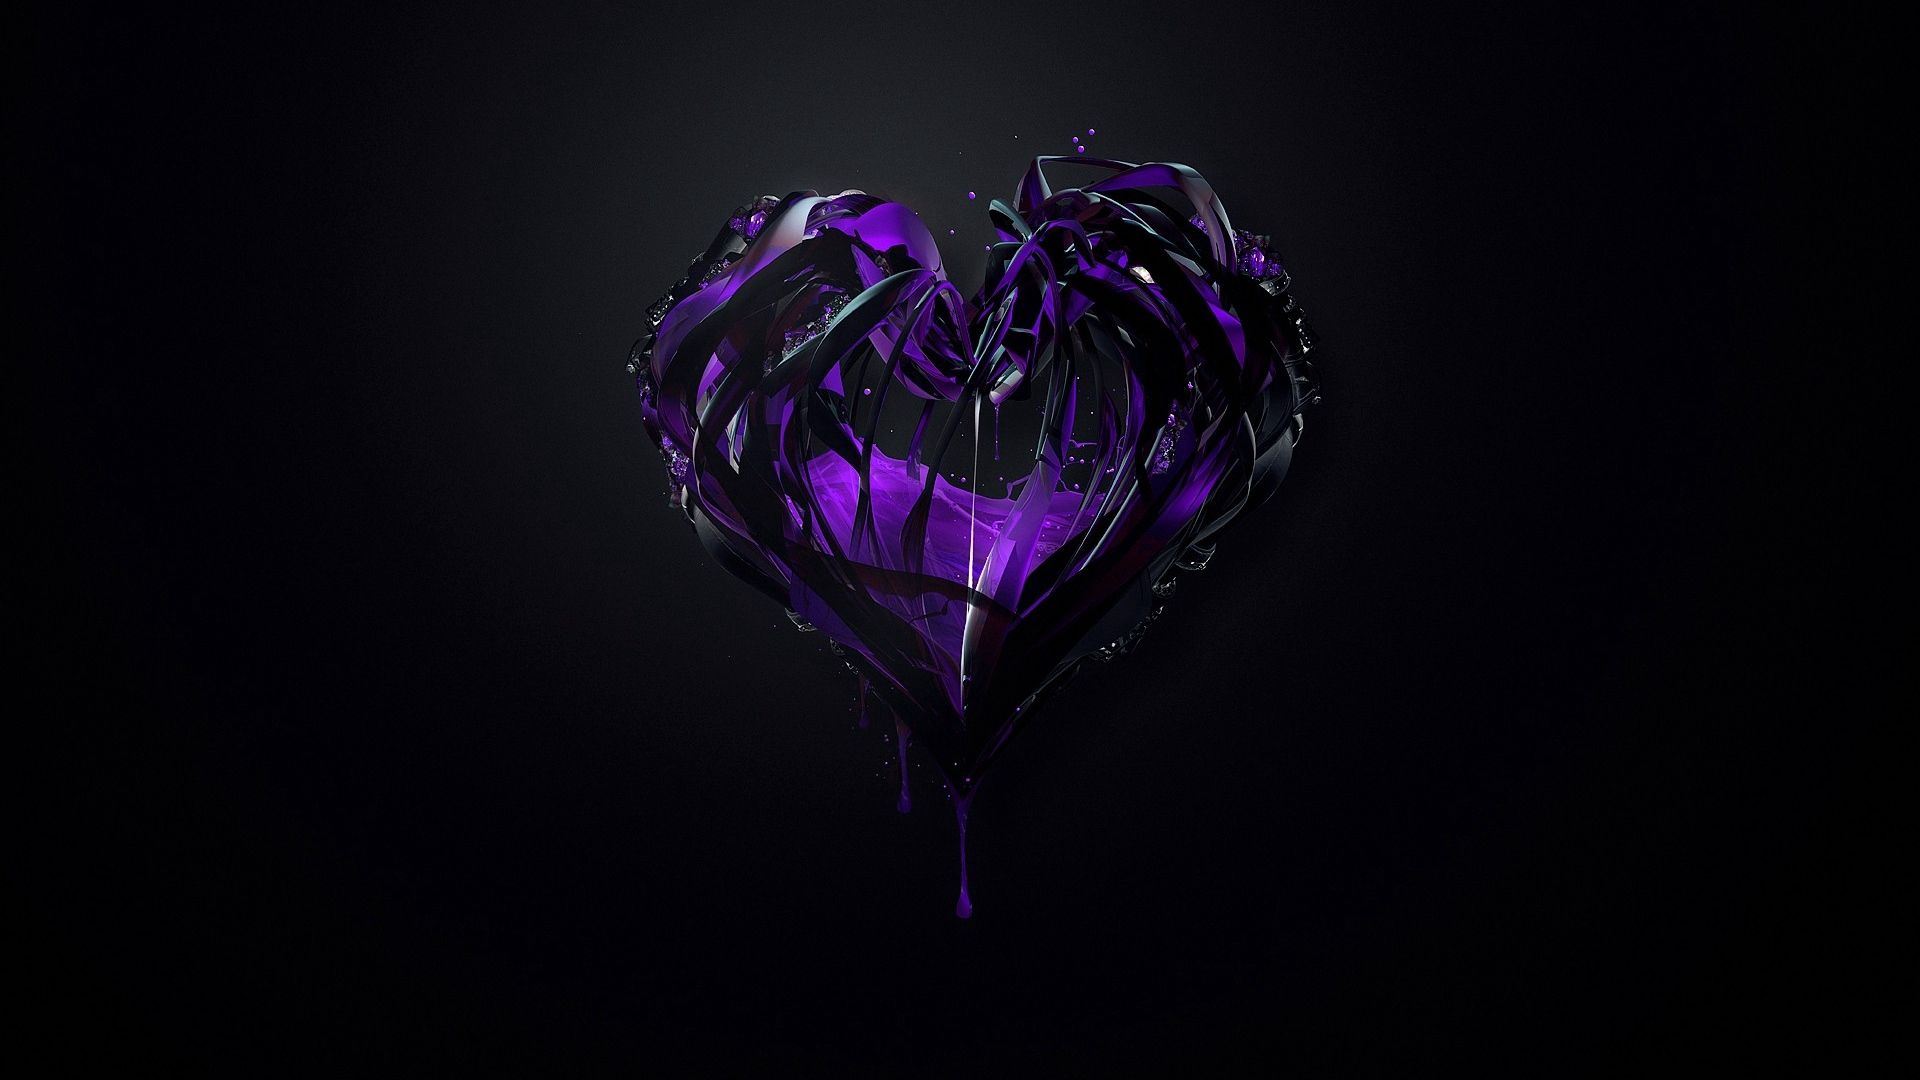 Heart desktop wallpaper